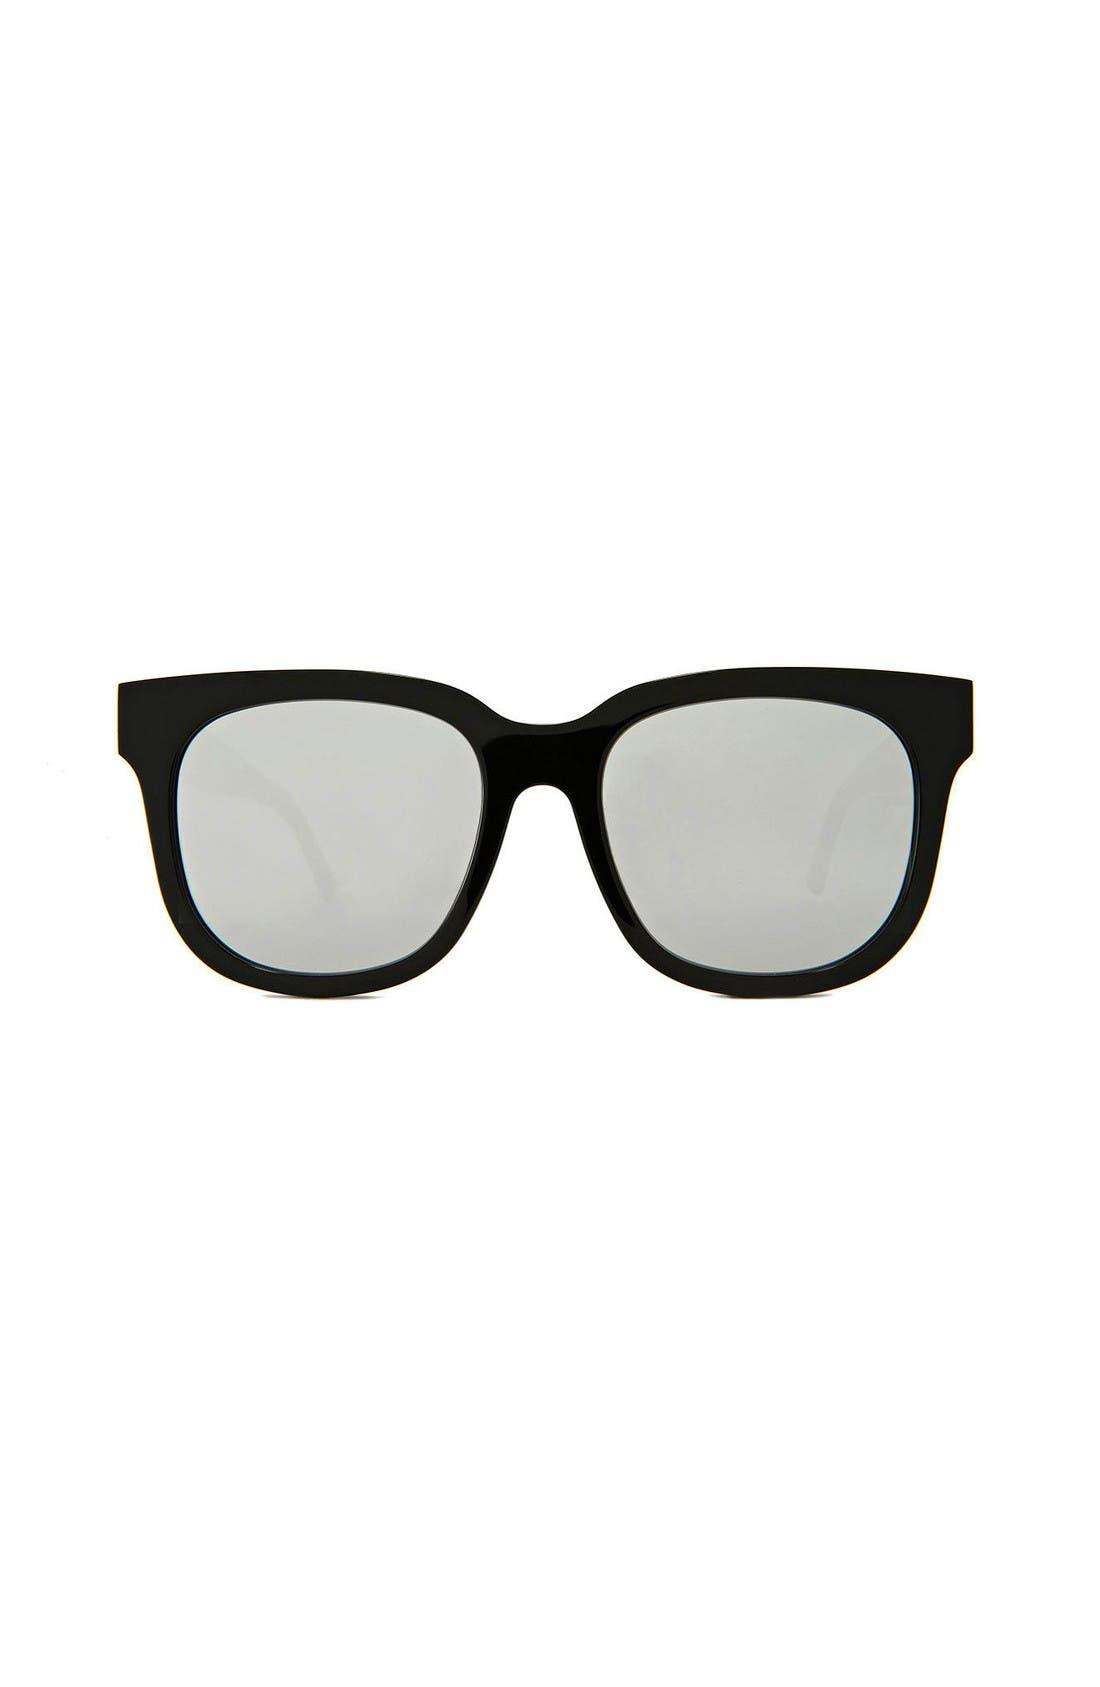 Alternate Image 1 Selected - Gentle Monster Didi D 56mm Square Sunglasses